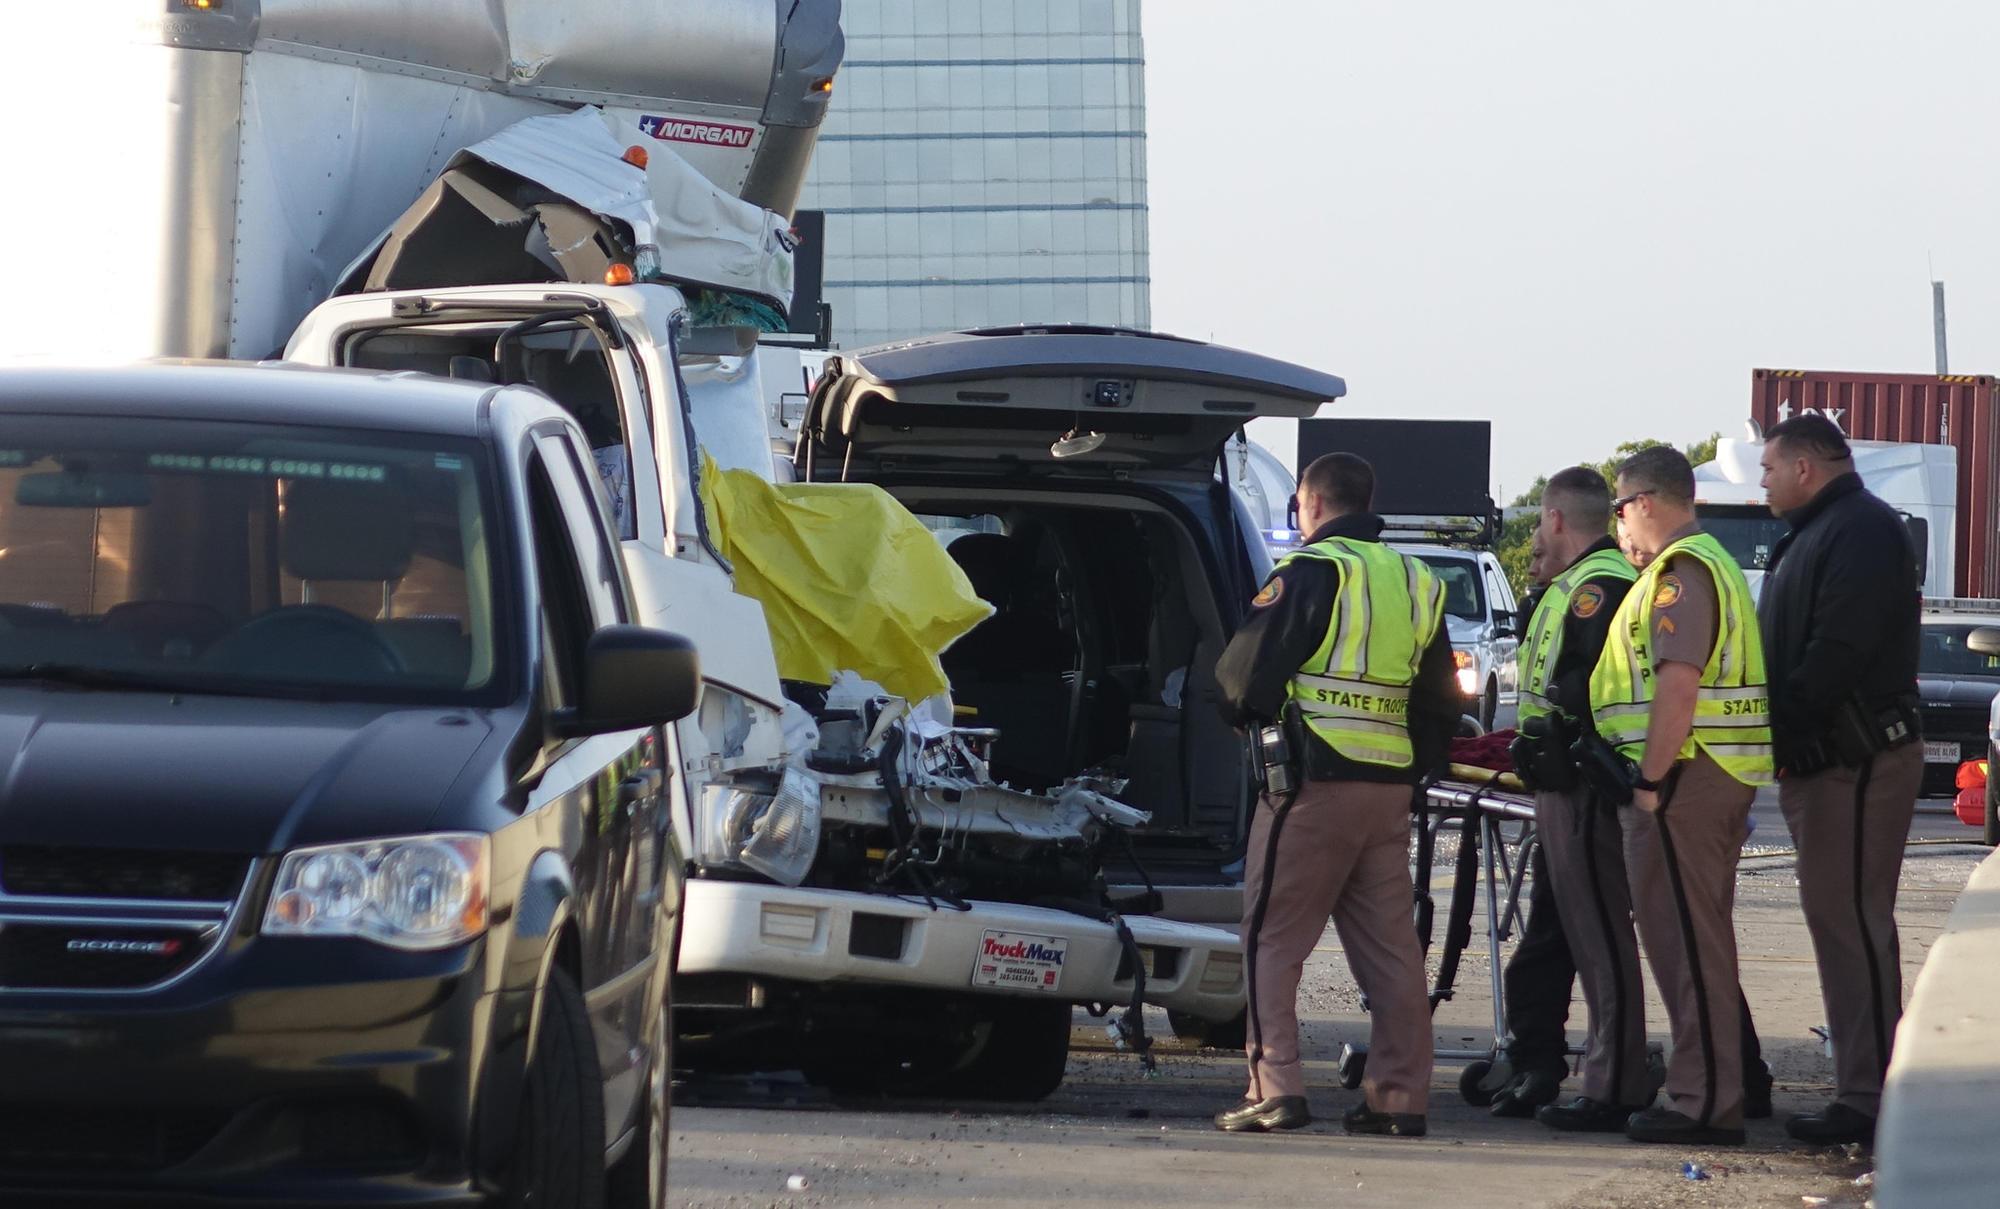 Florida Highway Patrol Traffic >> Man dies in I-95 crash in Broward; traffic snarled for hours - Sun Sentinel